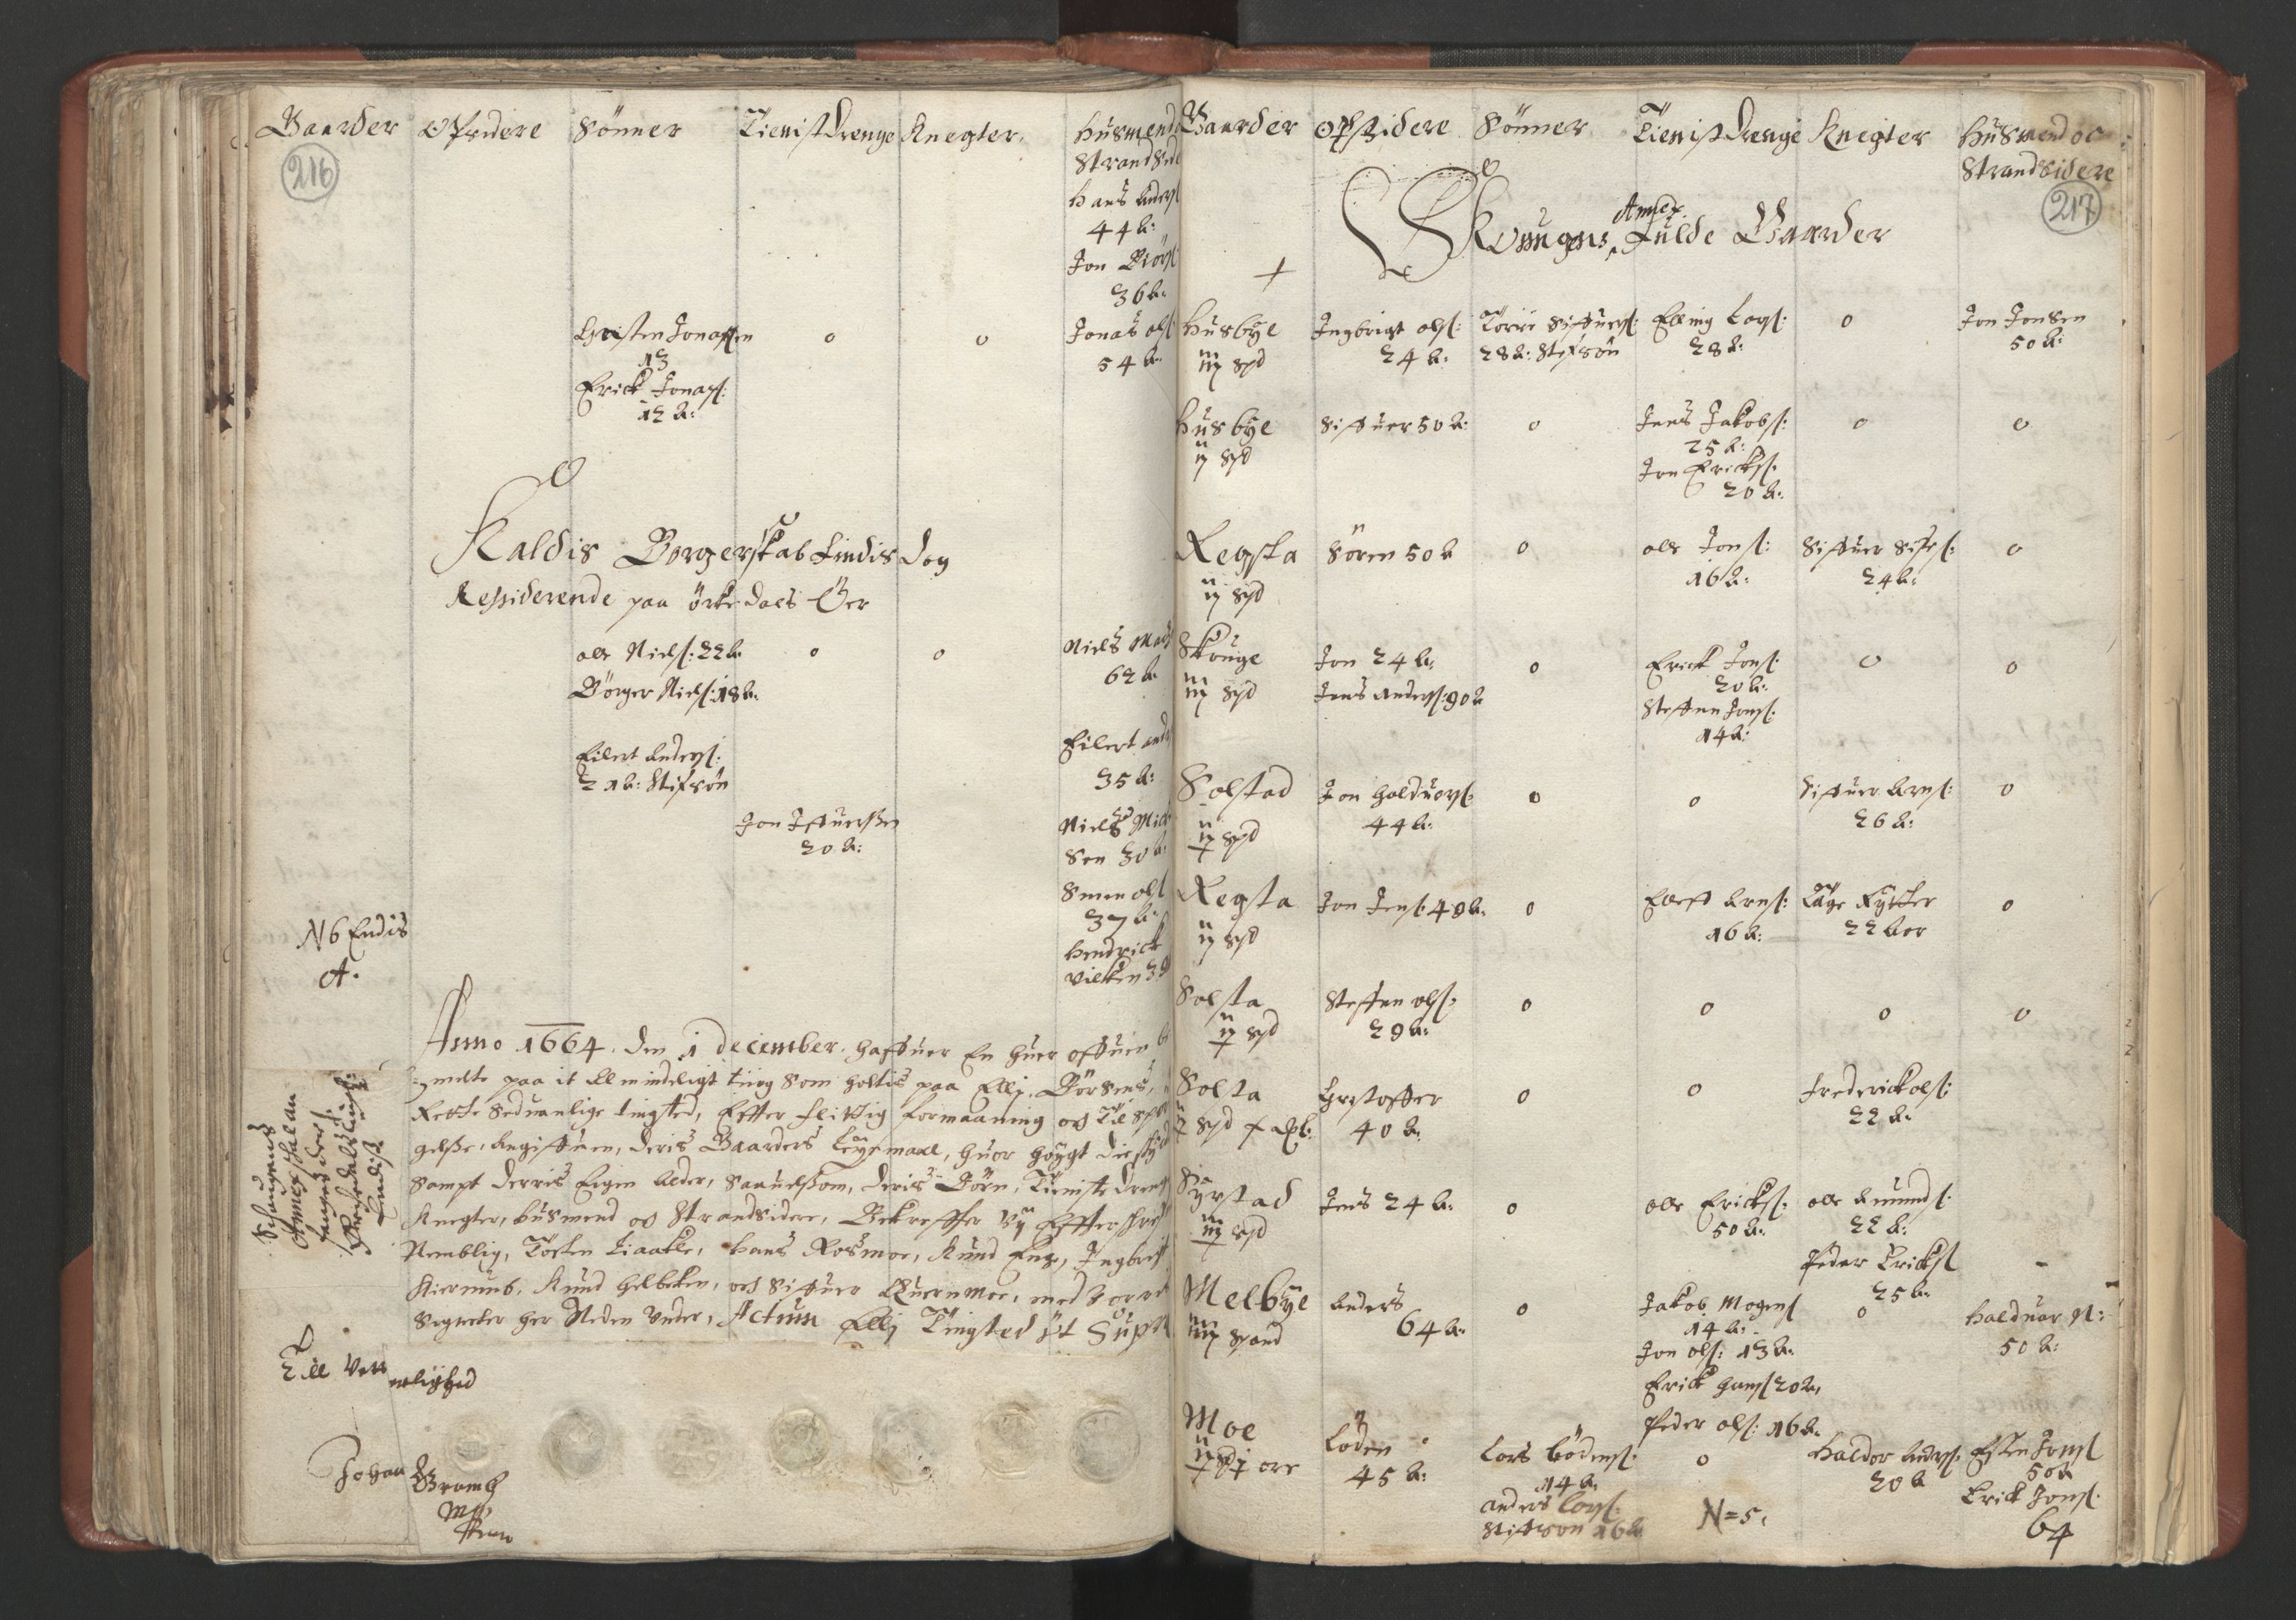 RA, Fogdenes og sorenskrivernes manntall 1664-1666, nr. 18: Gauldal fogderi, Strinda fogderi og Orkdal fogderi, 1664, s. 216-217